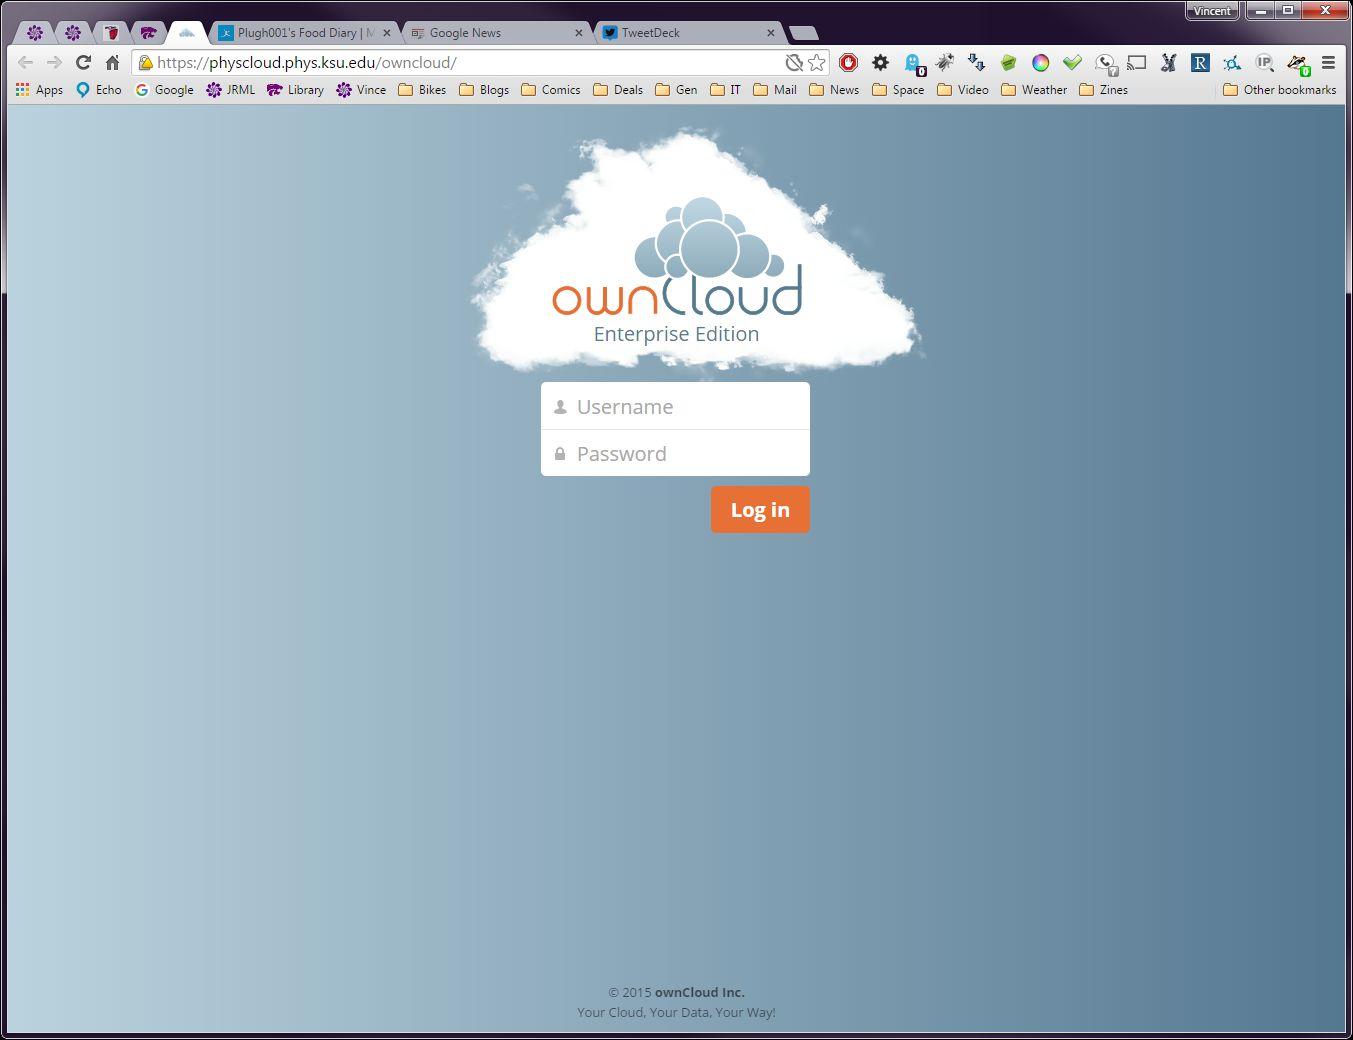 owncloud apk 2.8